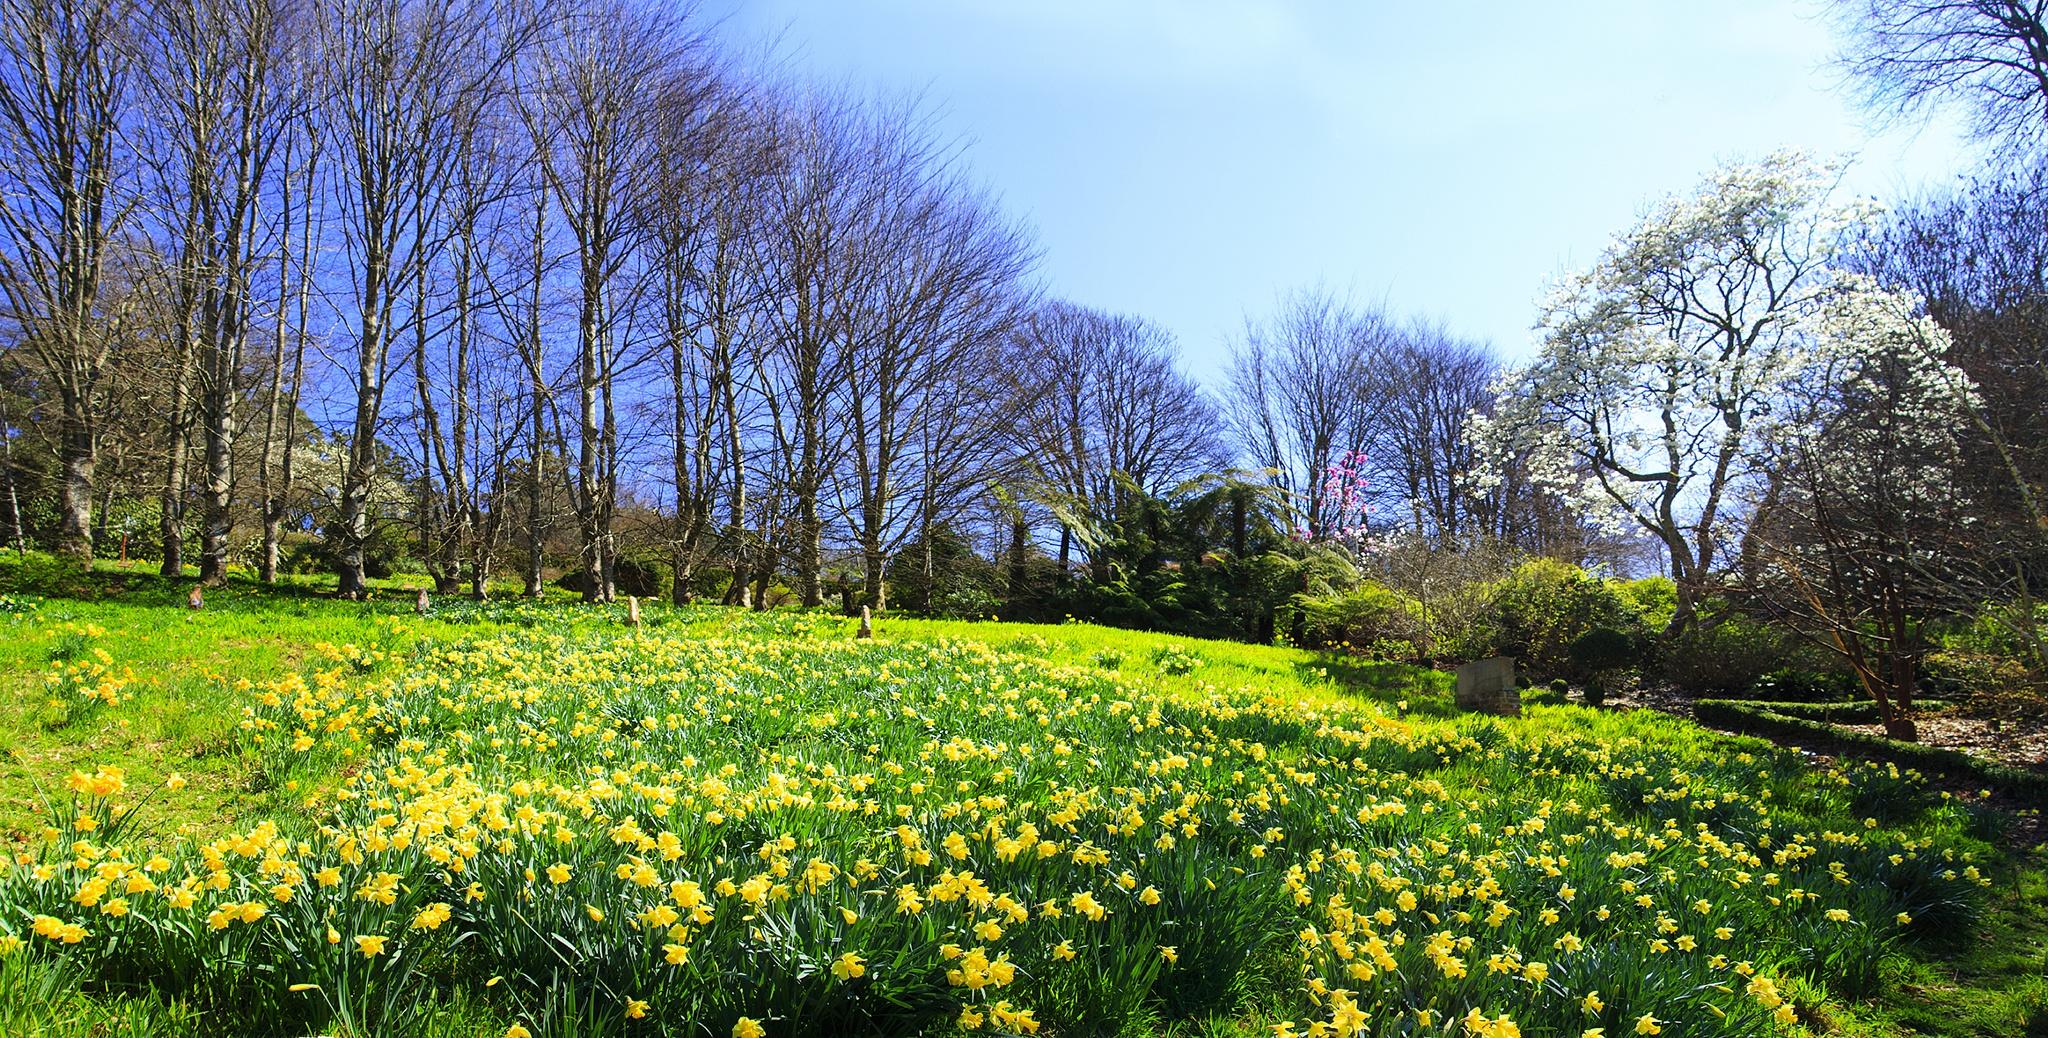 Daffodil fields by Lois Larner